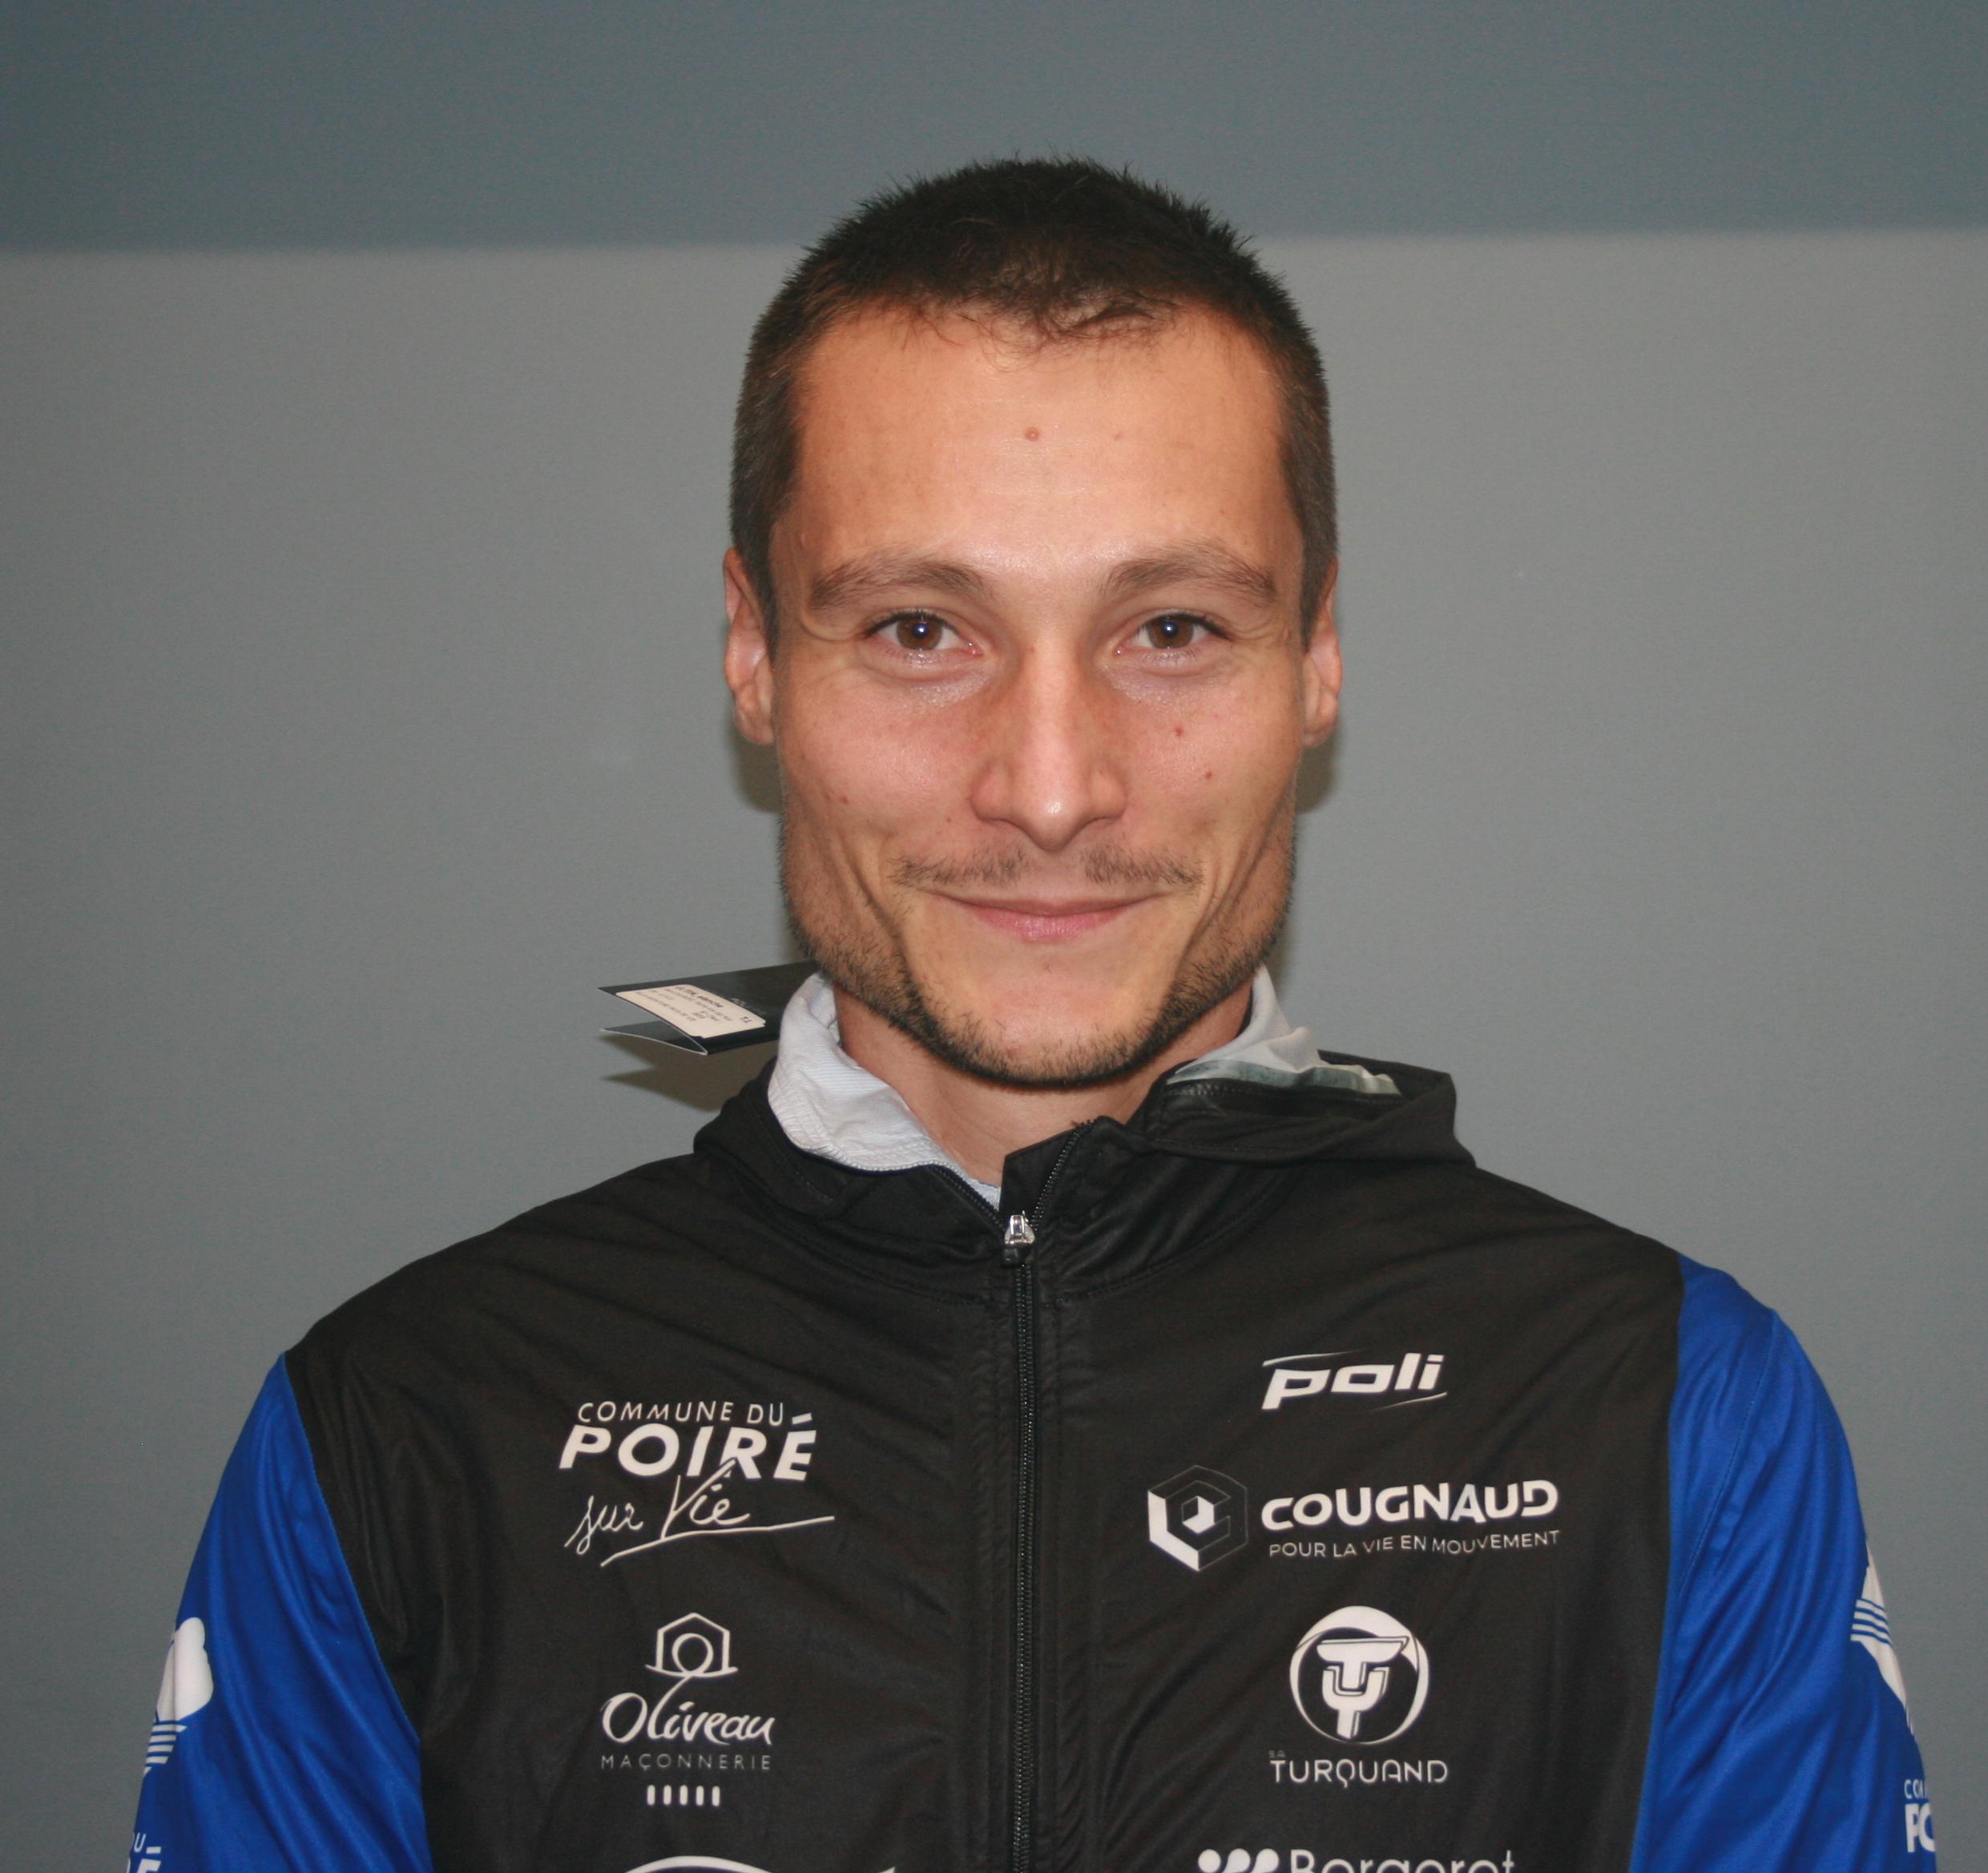 Olivier Le Cornec